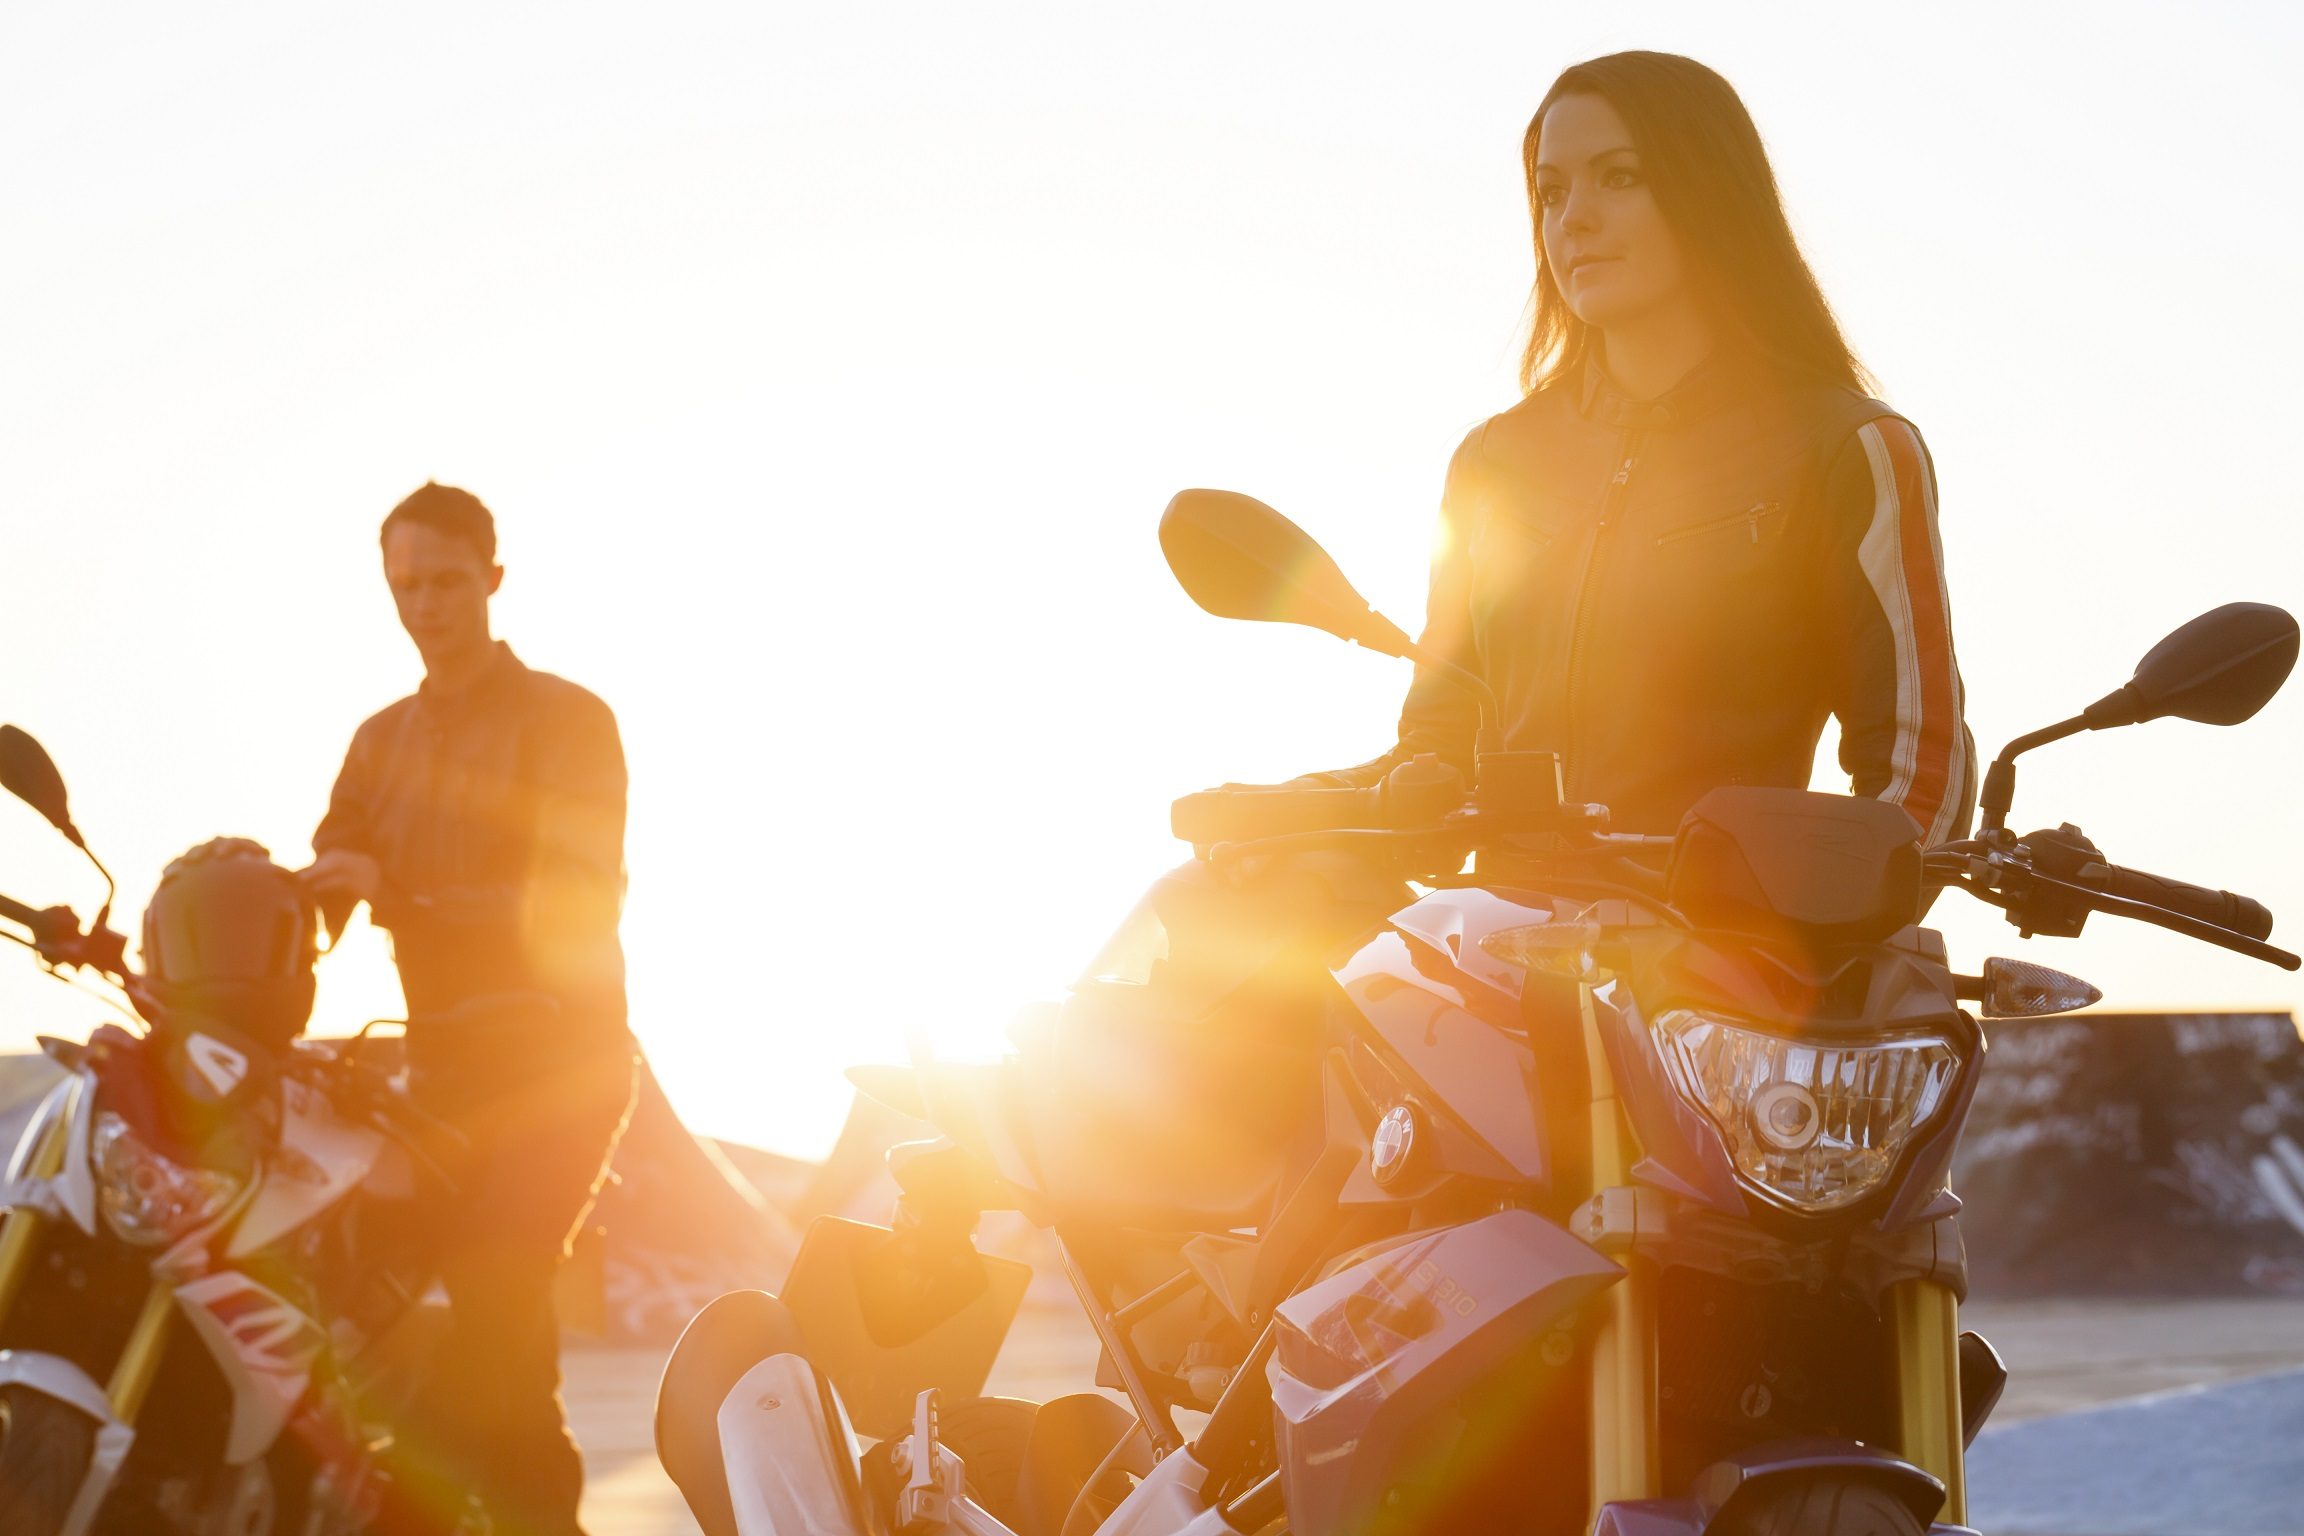 moto bmw g 310 r tem boa aceiracao entre o publico feminino